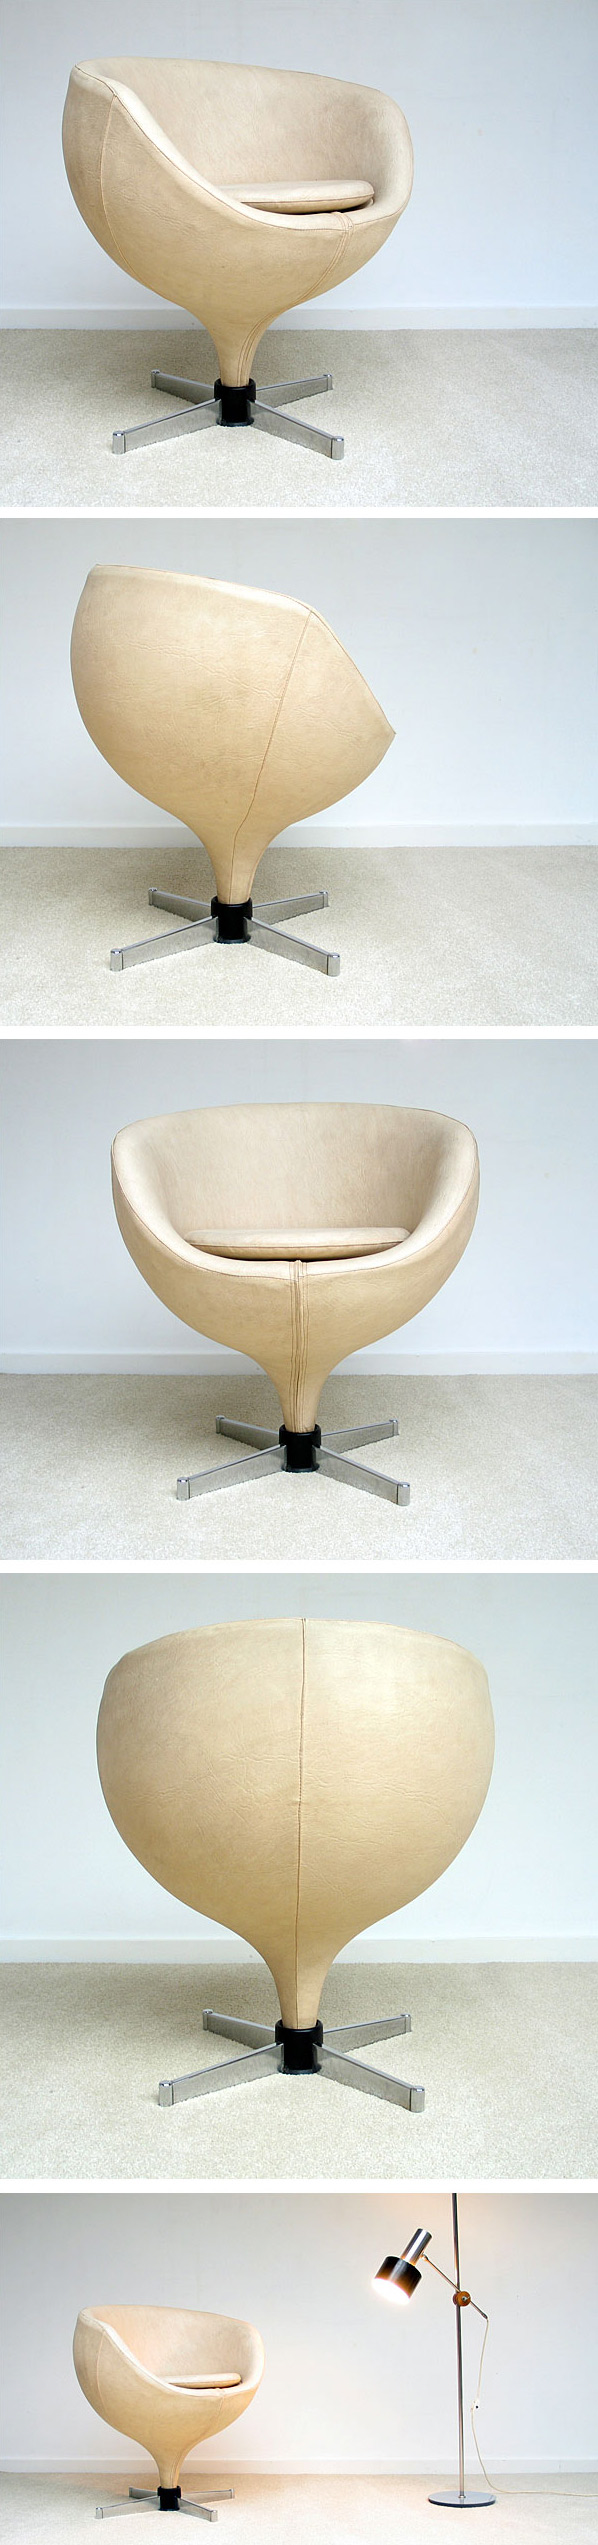 pierre guariche ball side chair model luna meurop 1960 furniture love. Black Bedroom Furniture Sets. Home Design Ideas